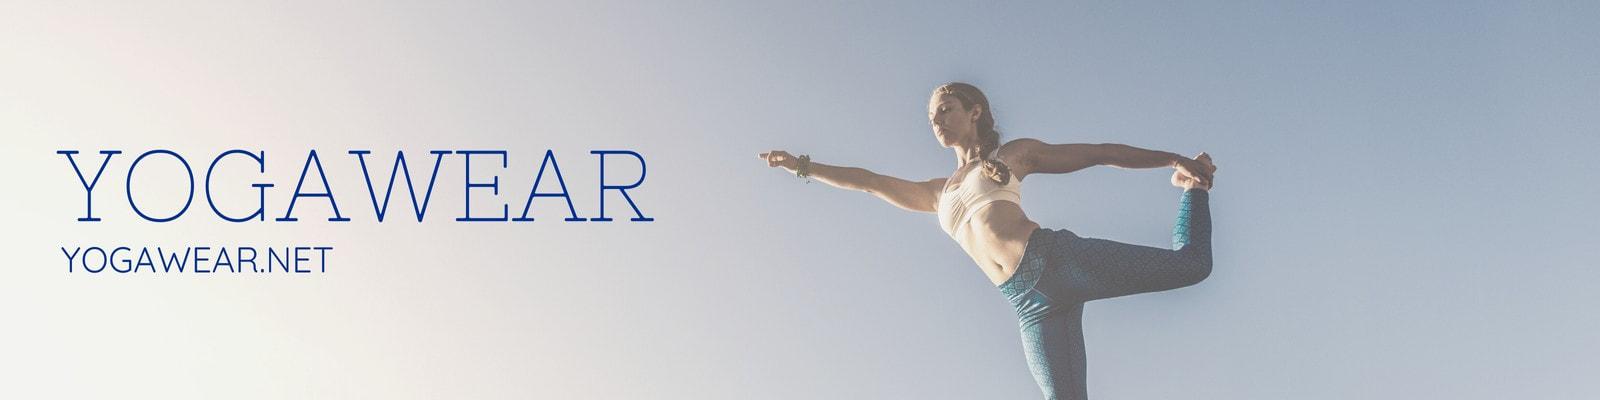 Yoga Activewear Etsy Banner